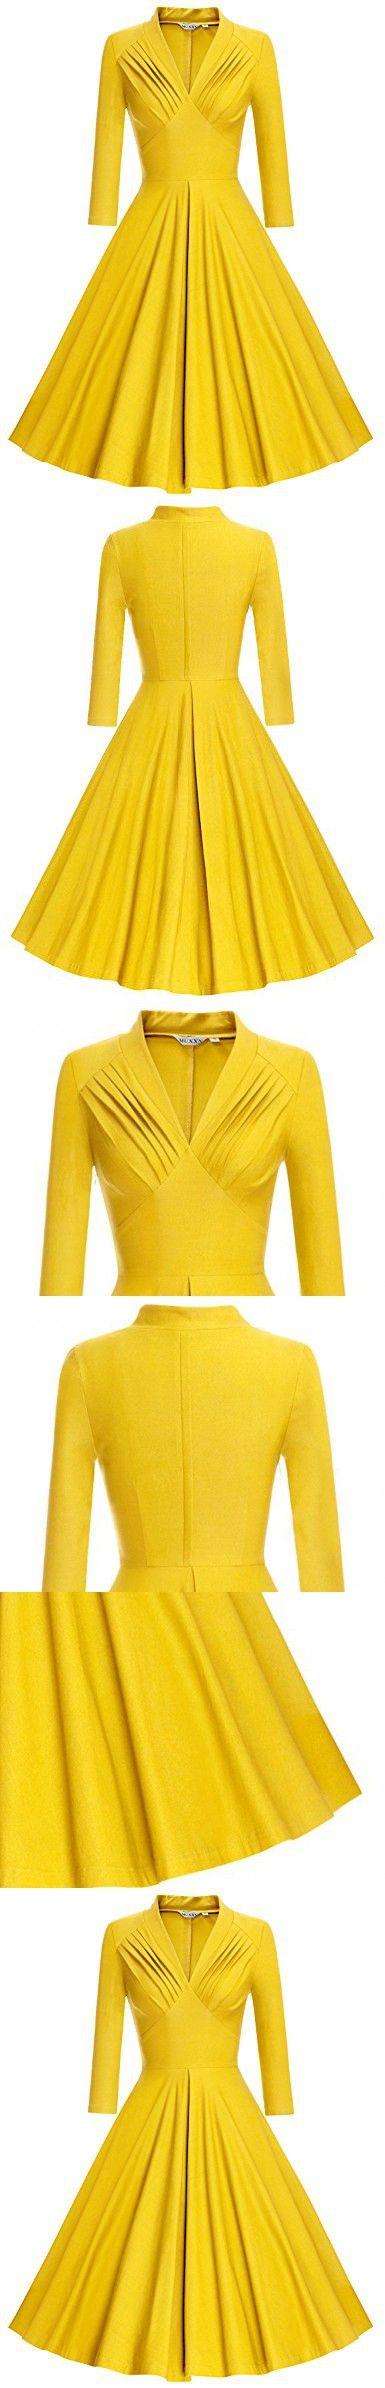 MUXXN Women's Vintage 3/4 Sleeve Knee Length Cocktail Swing Dress ( S Yellow)